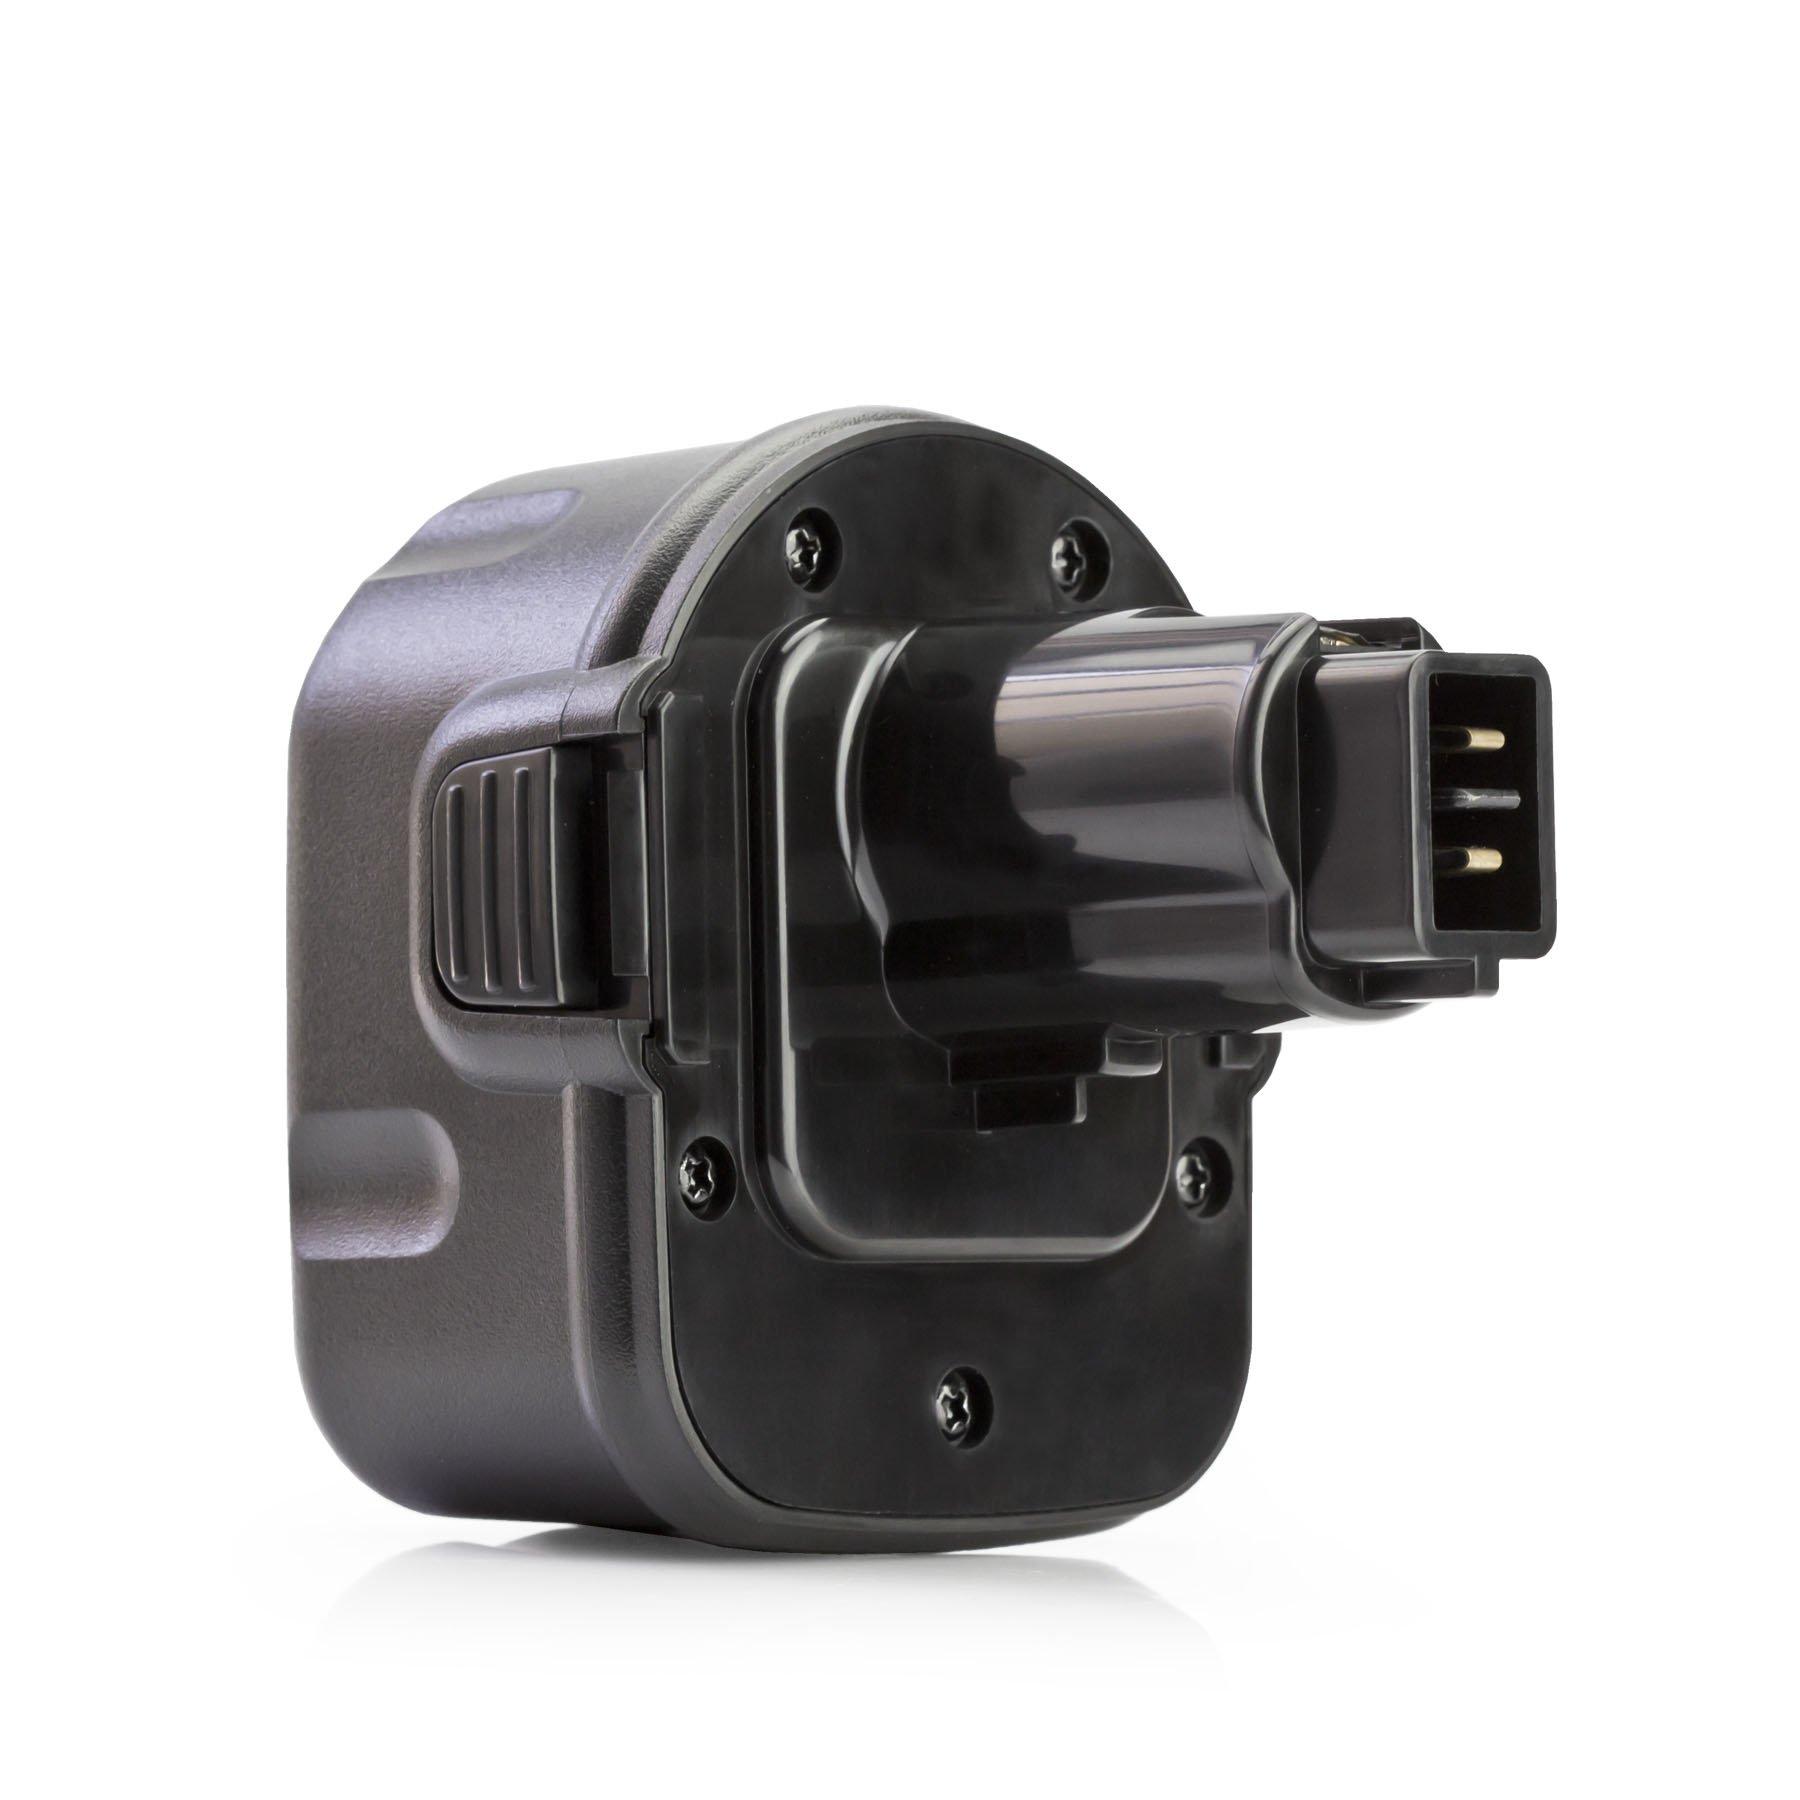 ExpertPower 12v 1500mAh NiMh Battery for Dewalt DC9071 DW9072 DW9071 DE9075 DE9074 DE9072 DE9071 DE9037 397745-01 152250-27